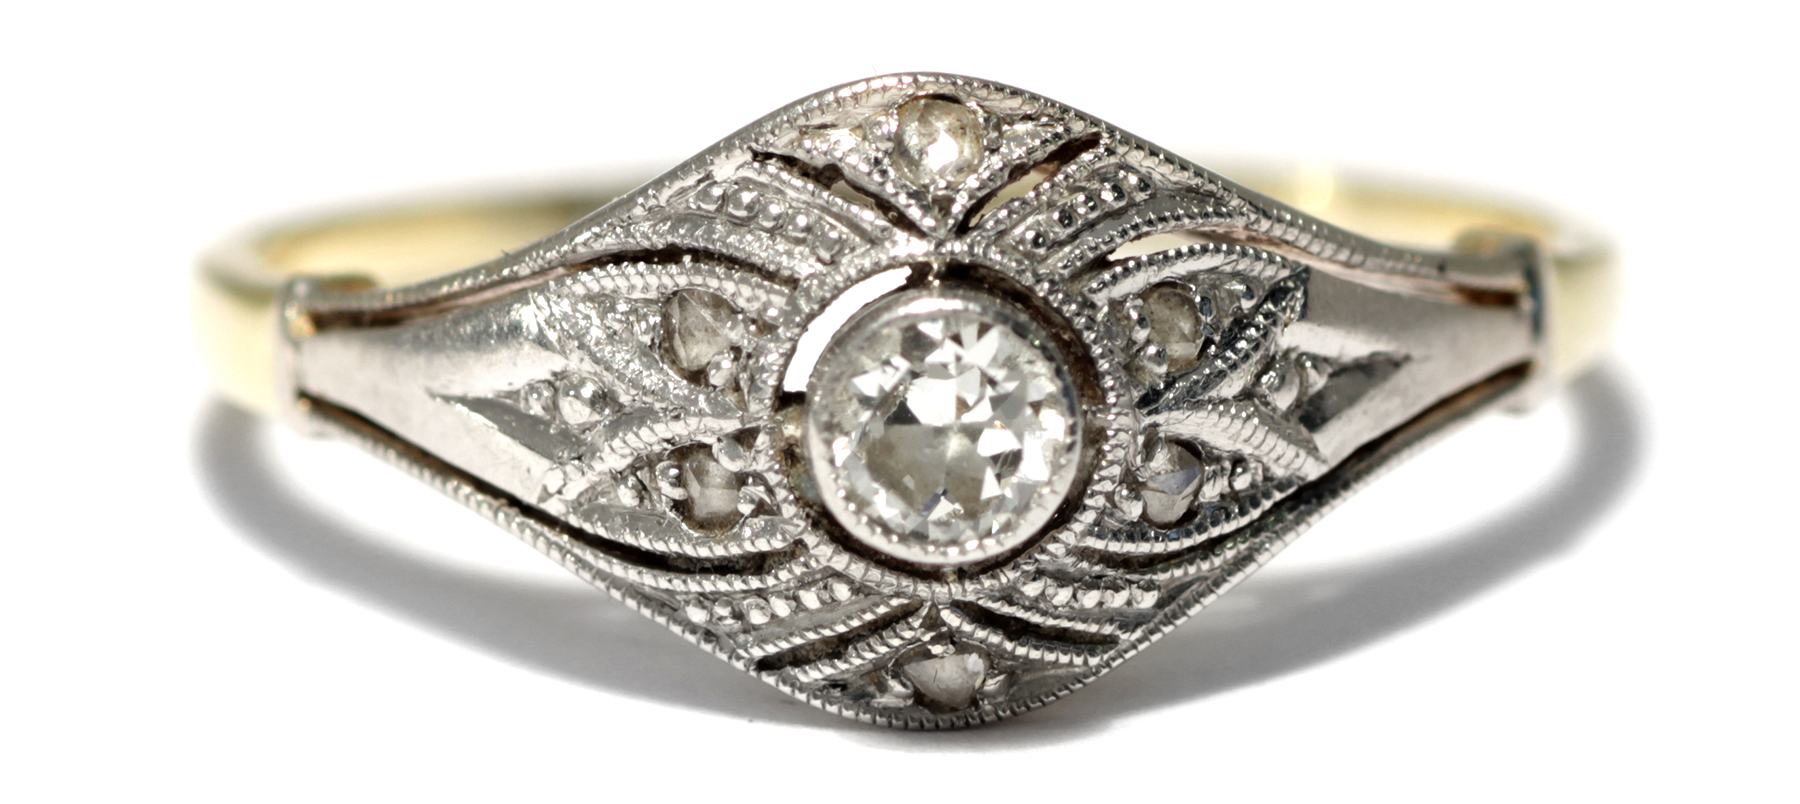 feiner art d co ring um 1925 diamant 585 gold platin verlobungsring diamanten ebay. Black Bedroom Furniture Sets. Home Design Ideas